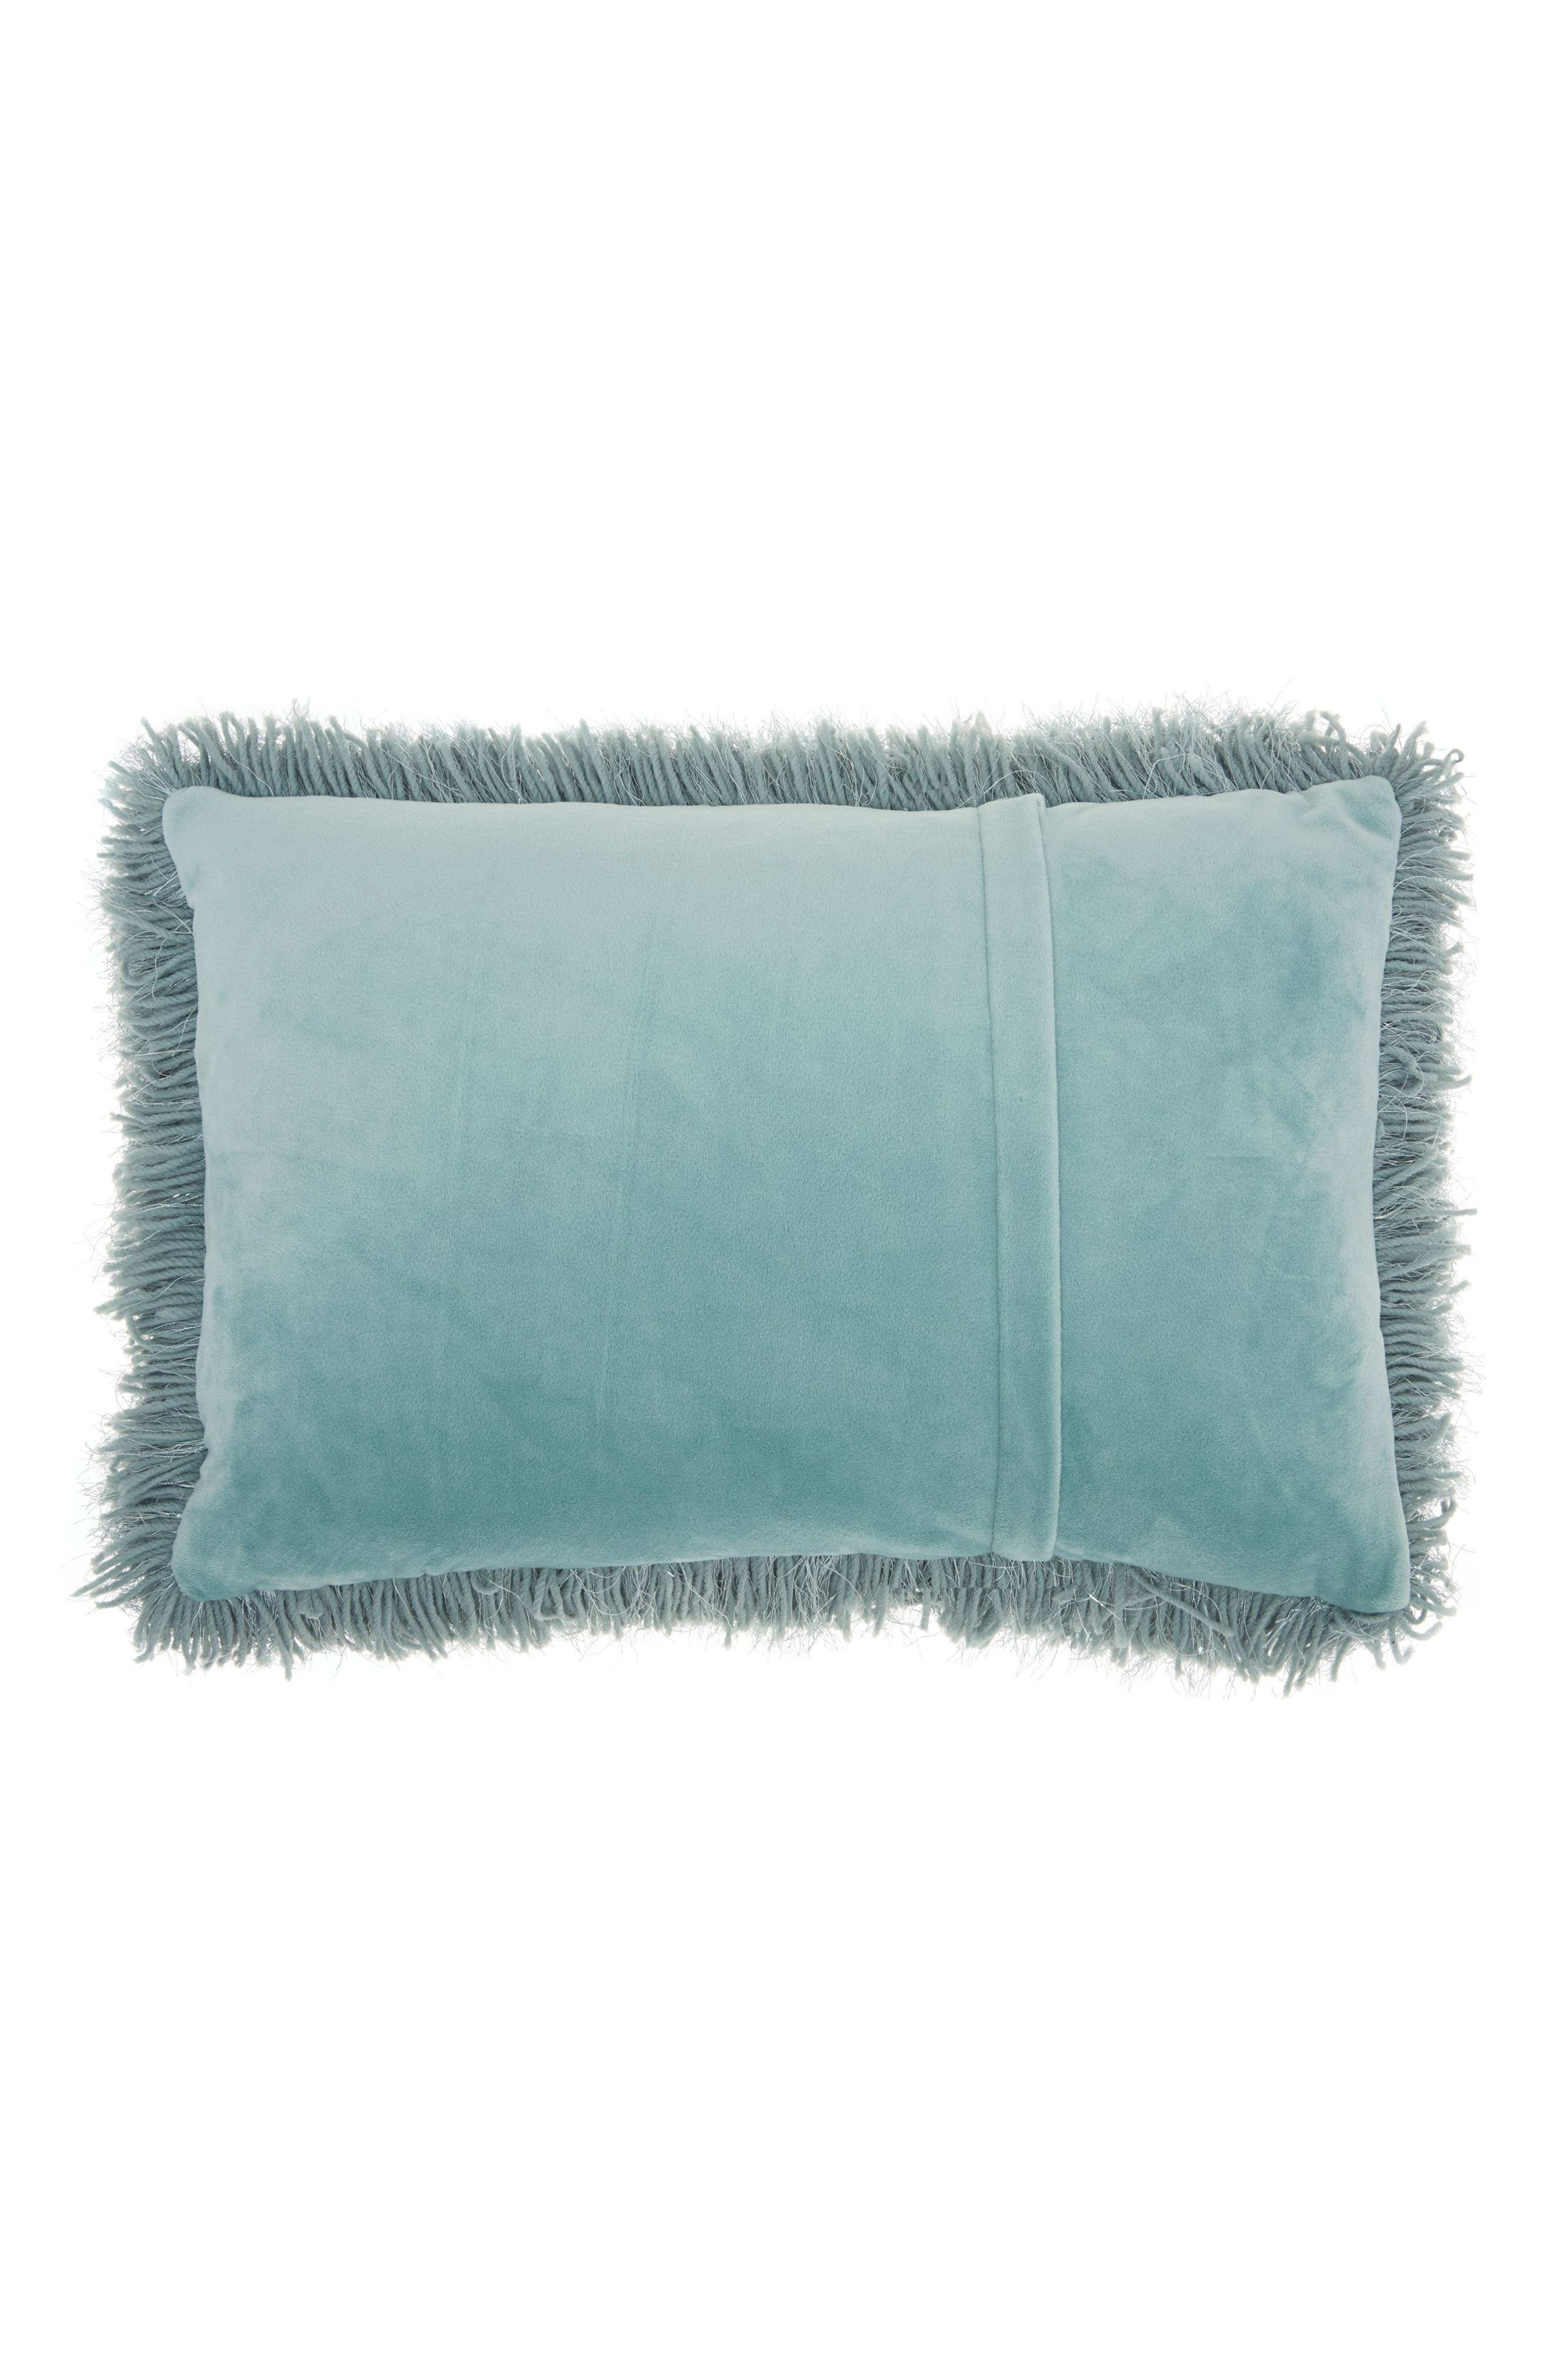 Yarn Shimmer Shag Pillow,                             Alternate thumbnail 2, color,                             Celadon